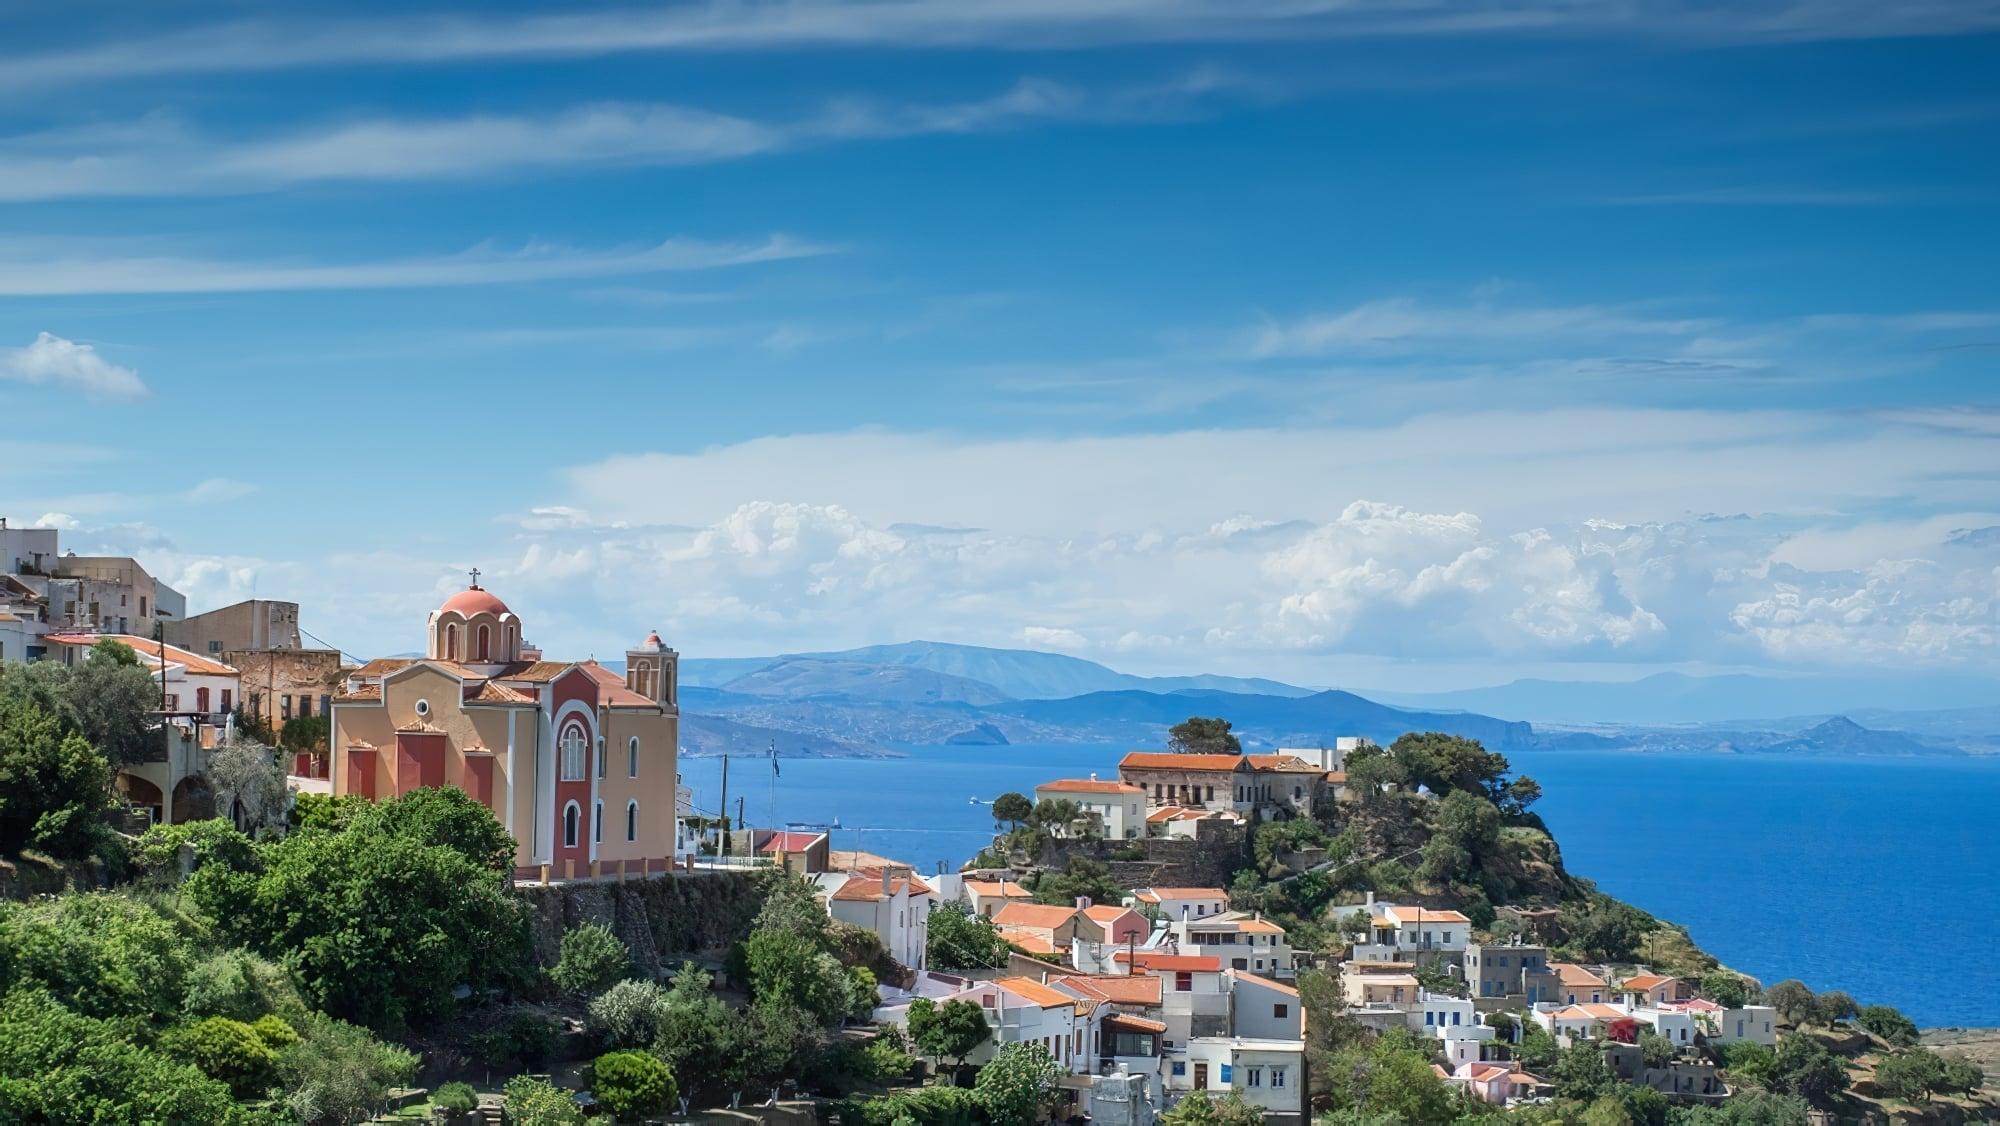 visiter kea grece montagnes villas mer